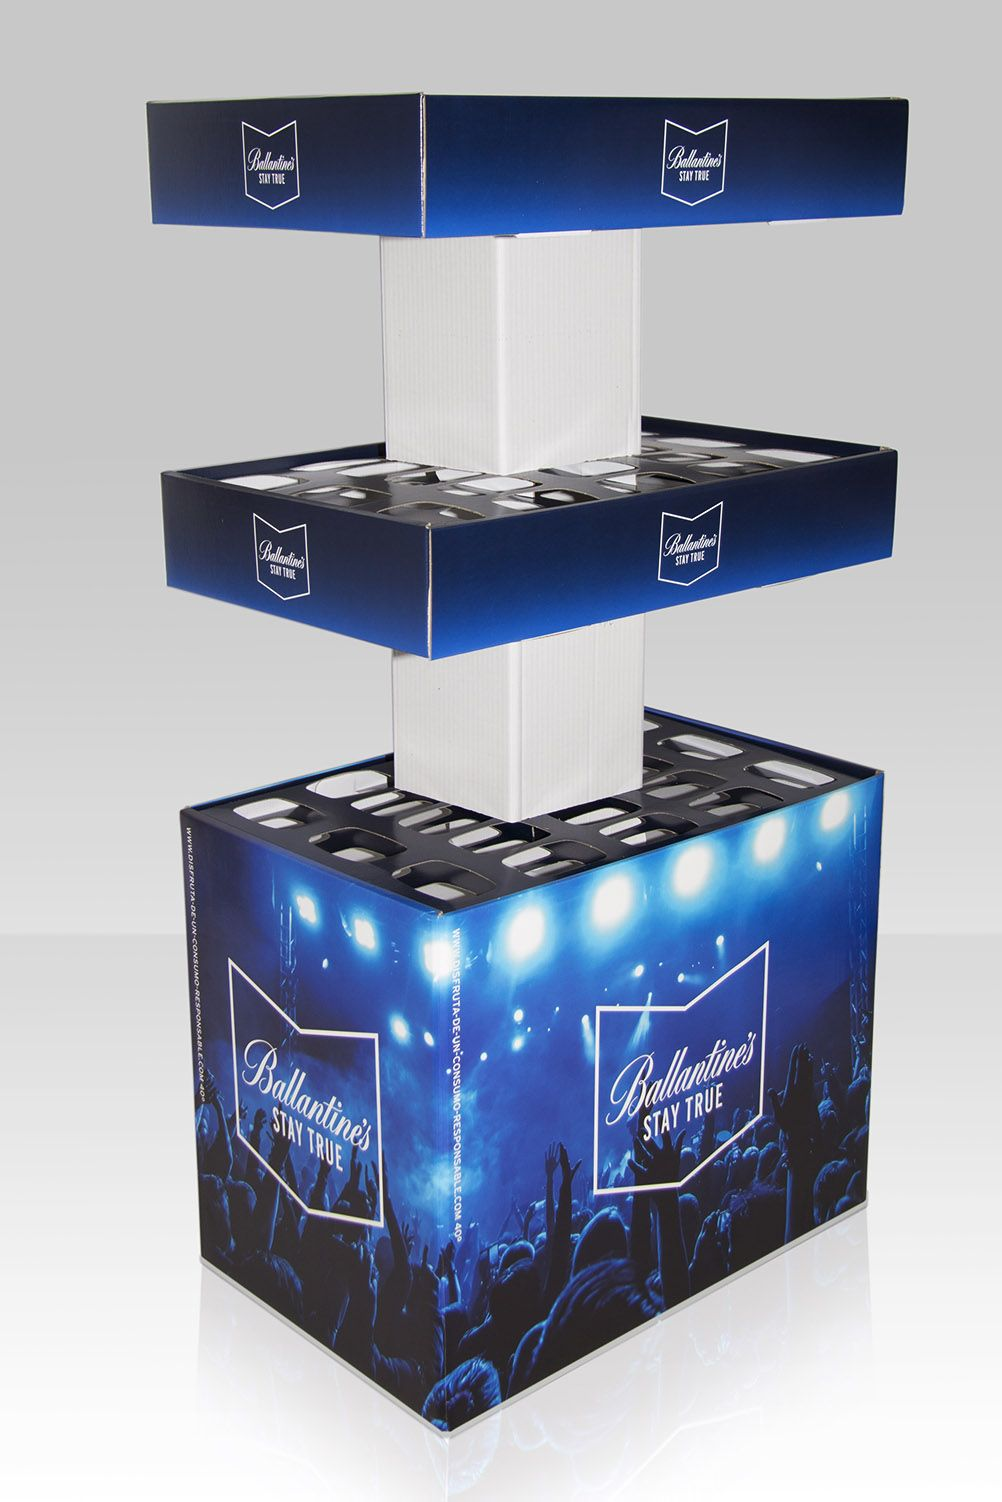 Boxes Mimopack Plv Packging Exhibidores De Carton